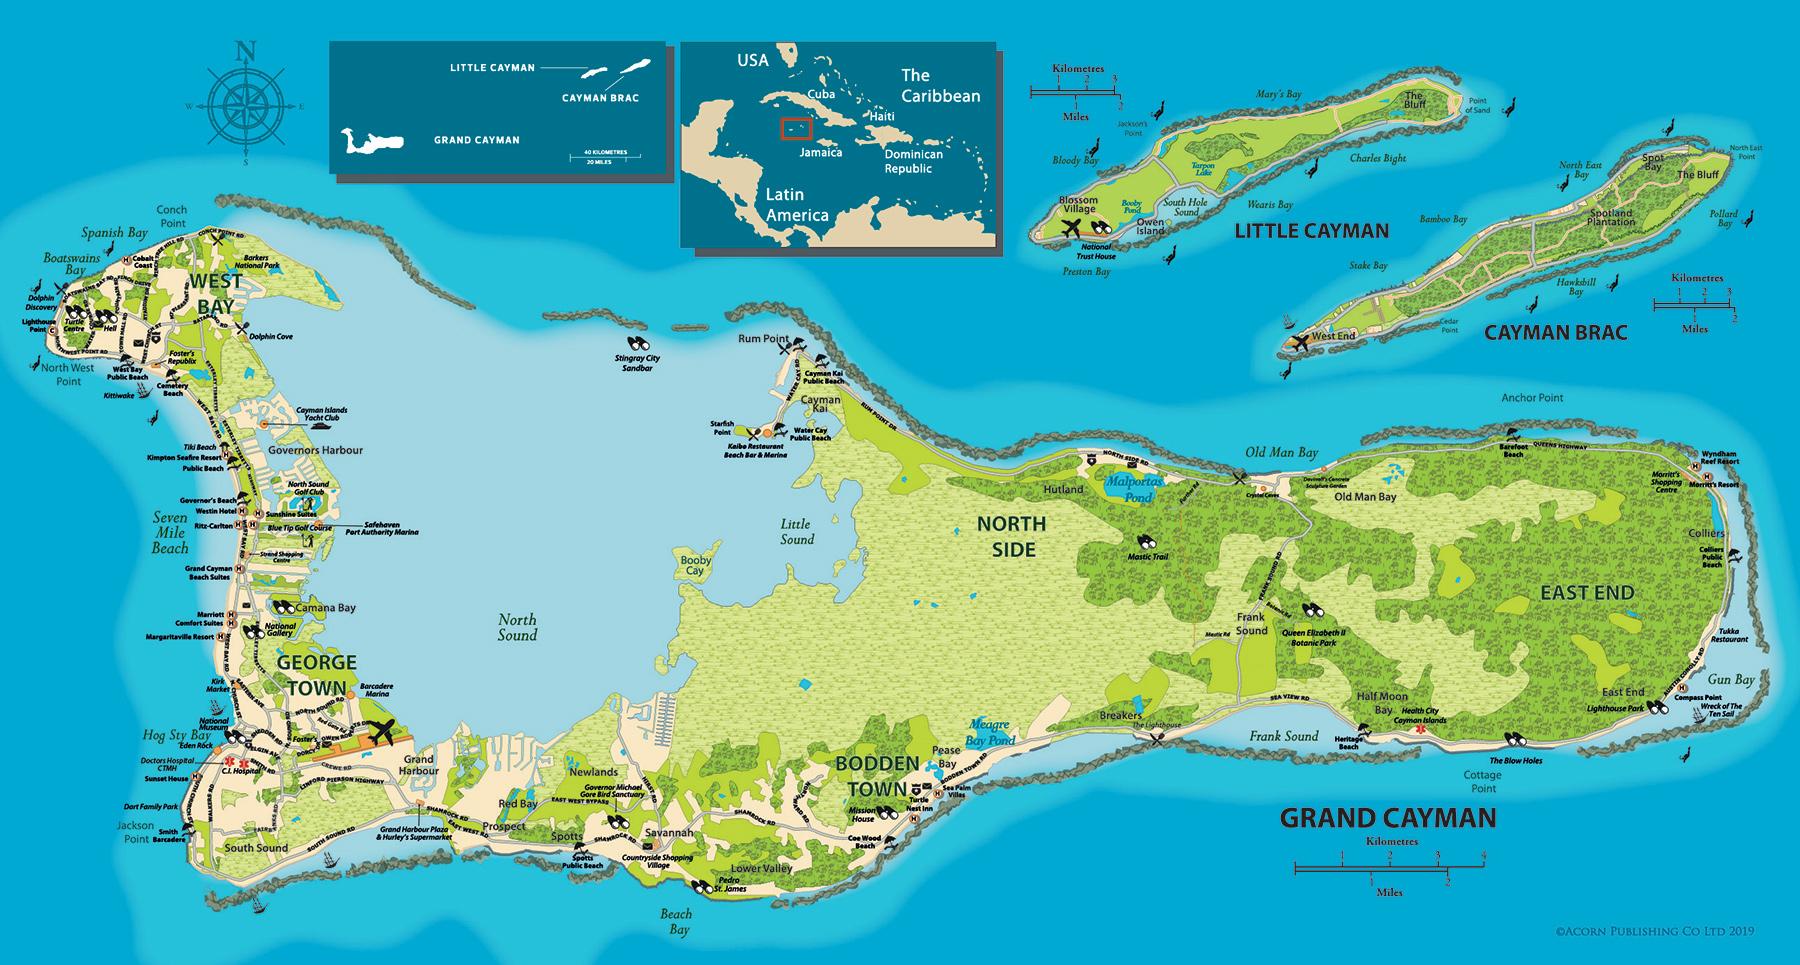 Cayman Islands Maps & Area Maps of Grand Cayman | Explore Cayman